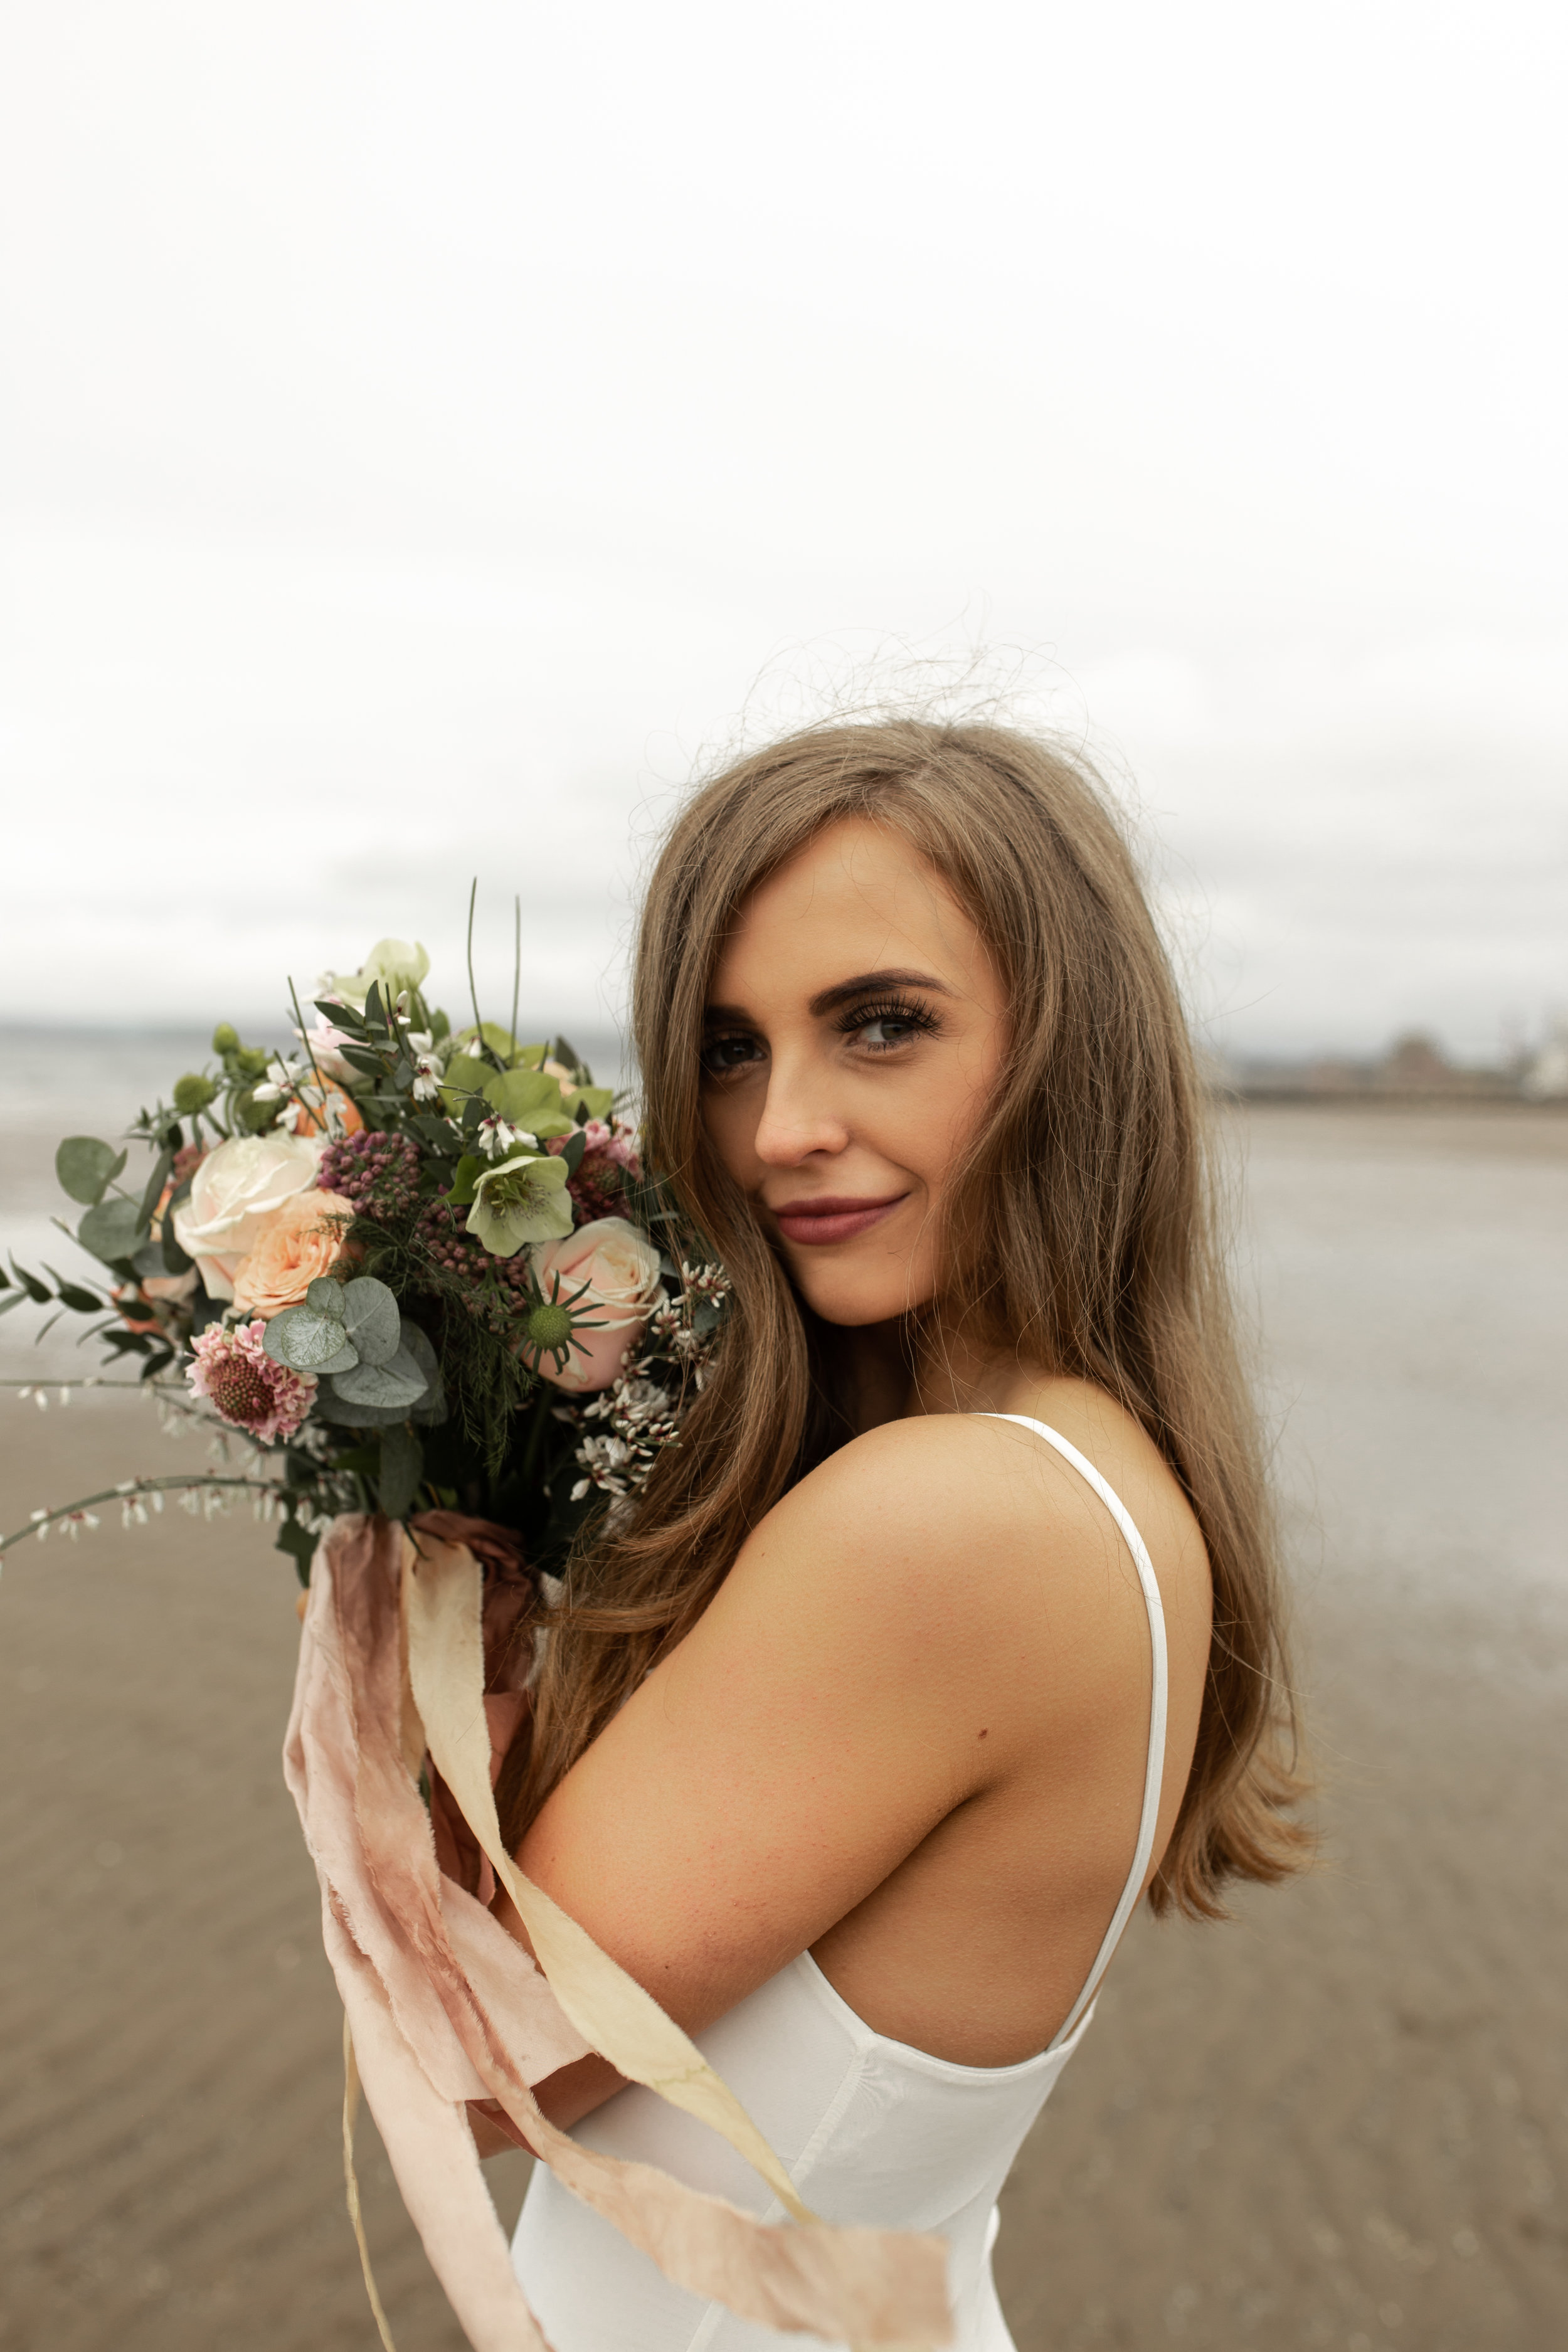 Paula_Russell_Photography_Edinburgh_Wedding_BBonnie_Flowers_12